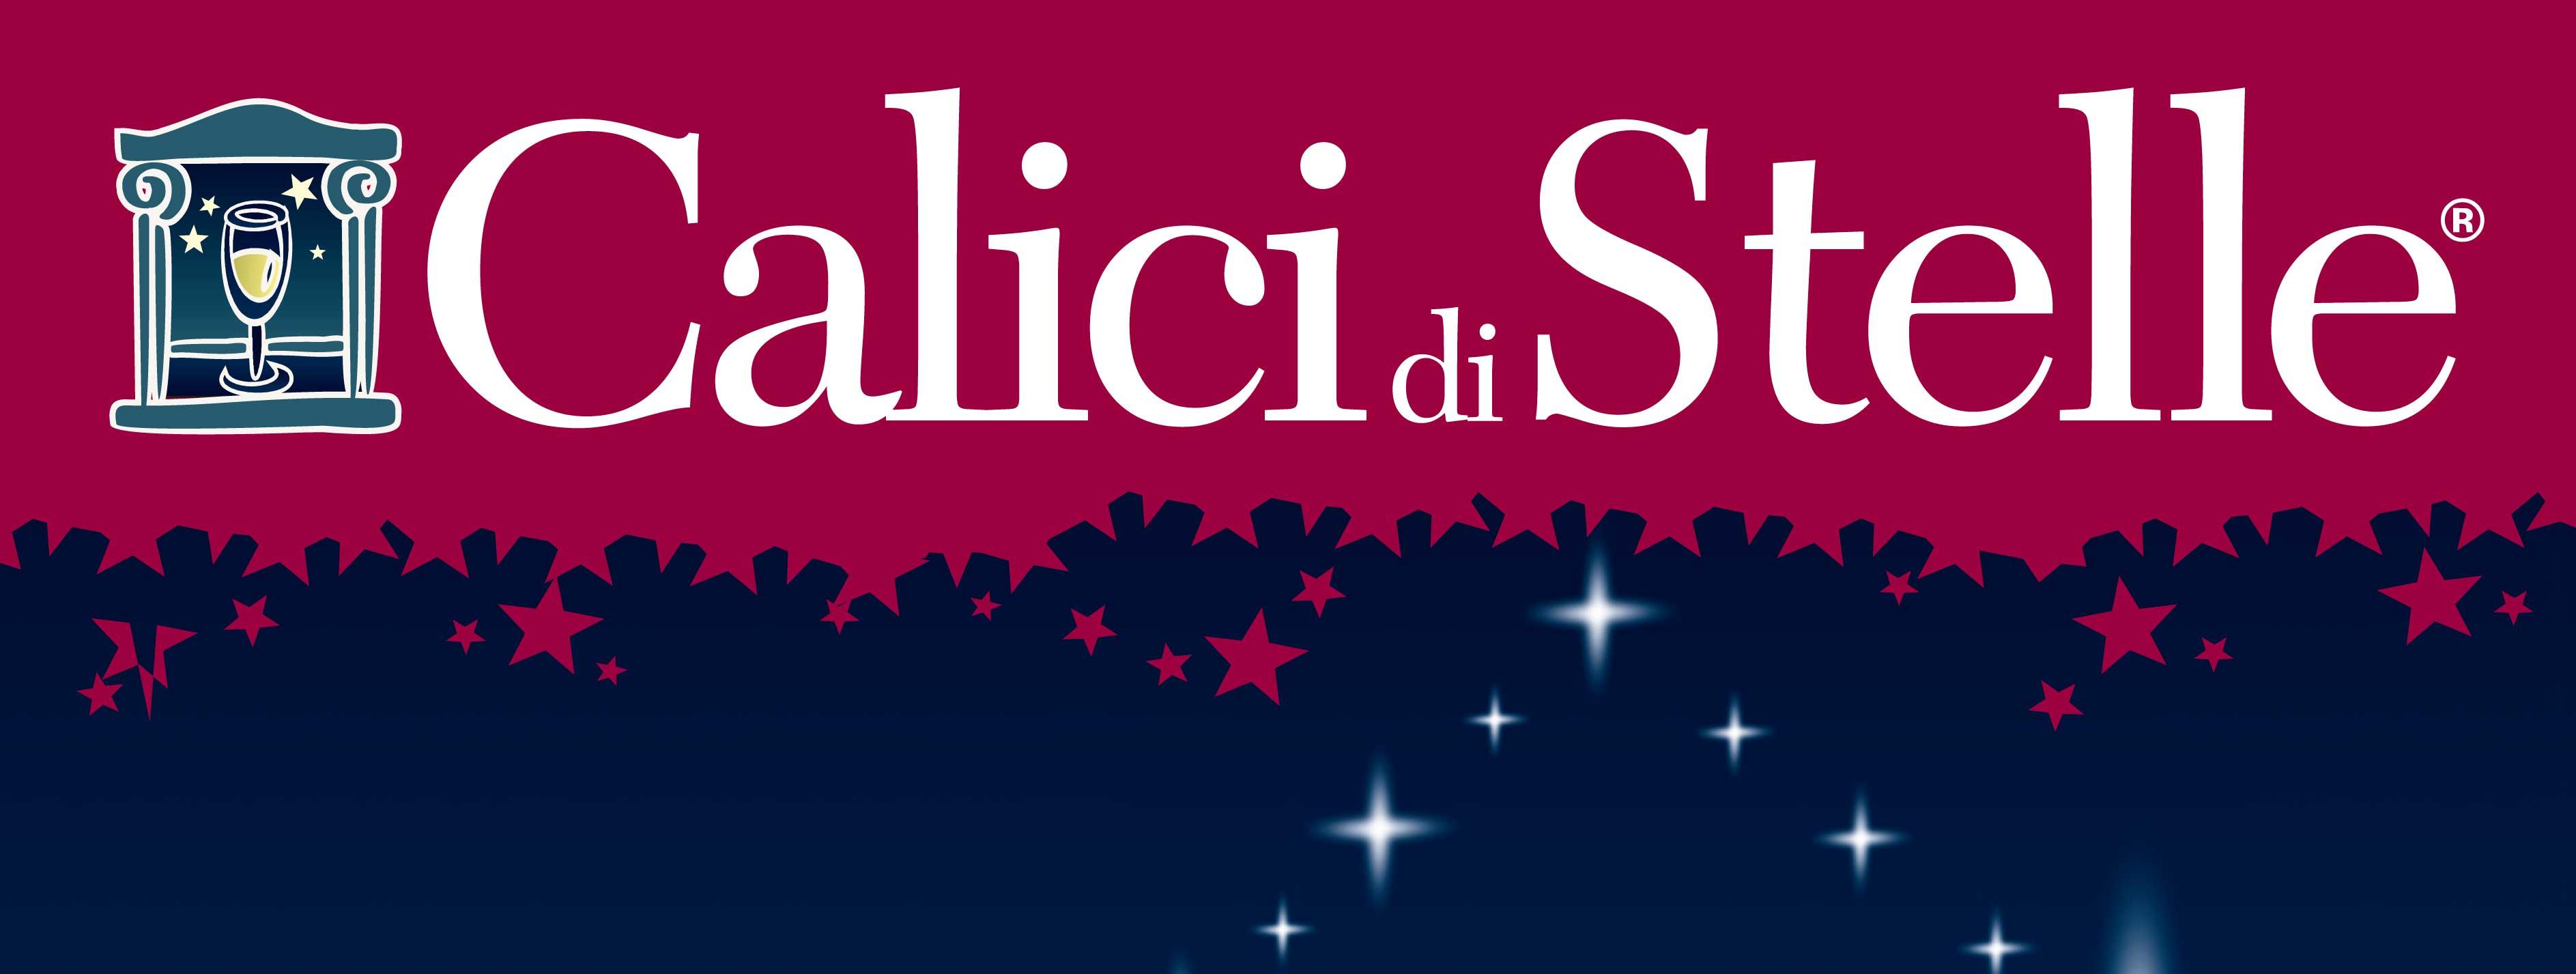 Calici di Stelle 2017 in Piemonte